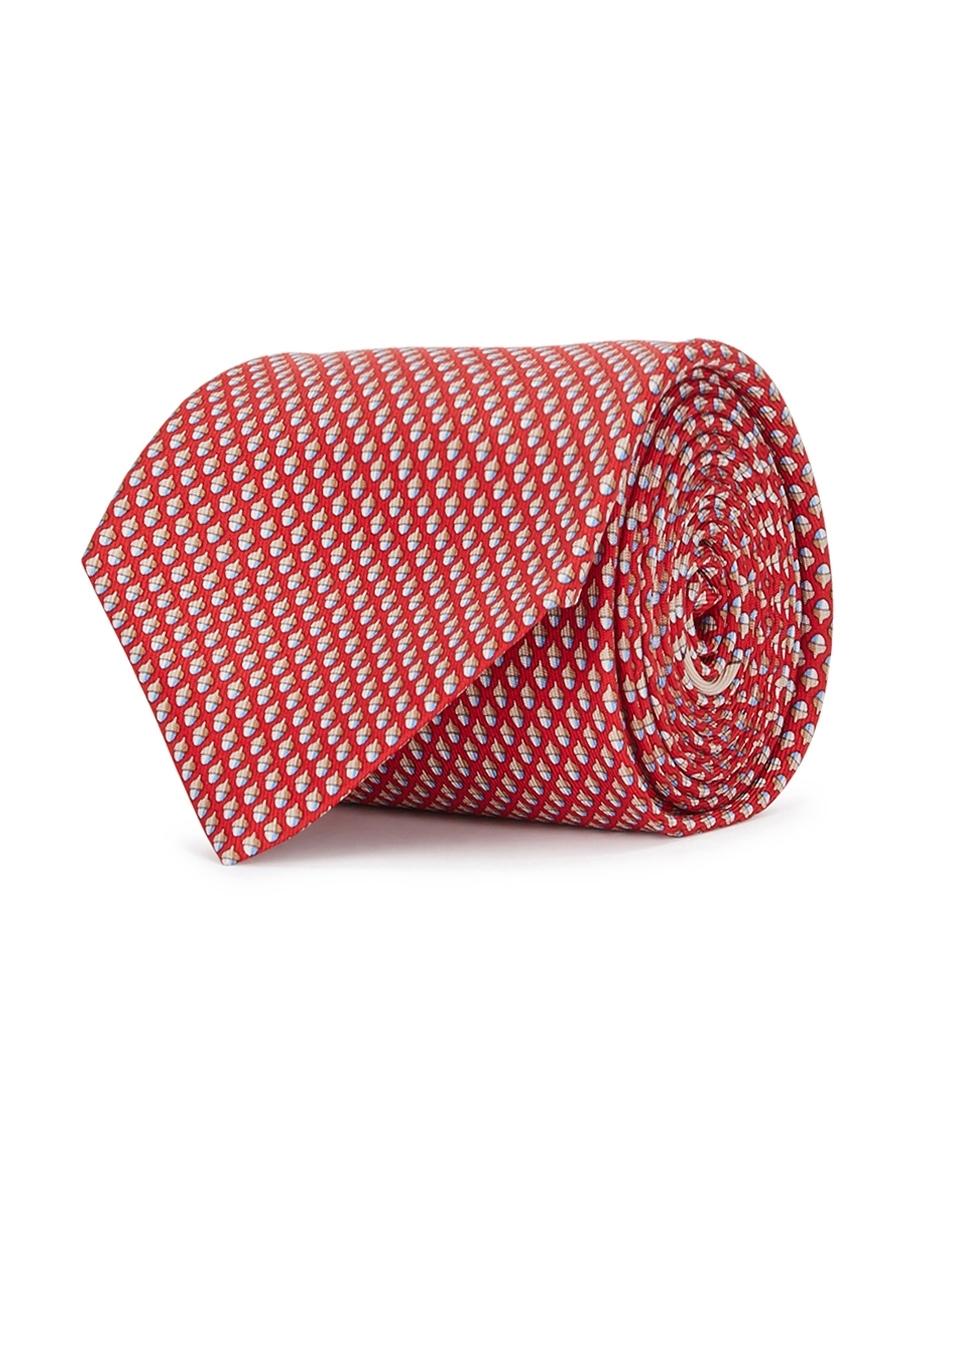 851c1eff6a83a Men s Designer Ties and Bow Ties - Harvey Nichols